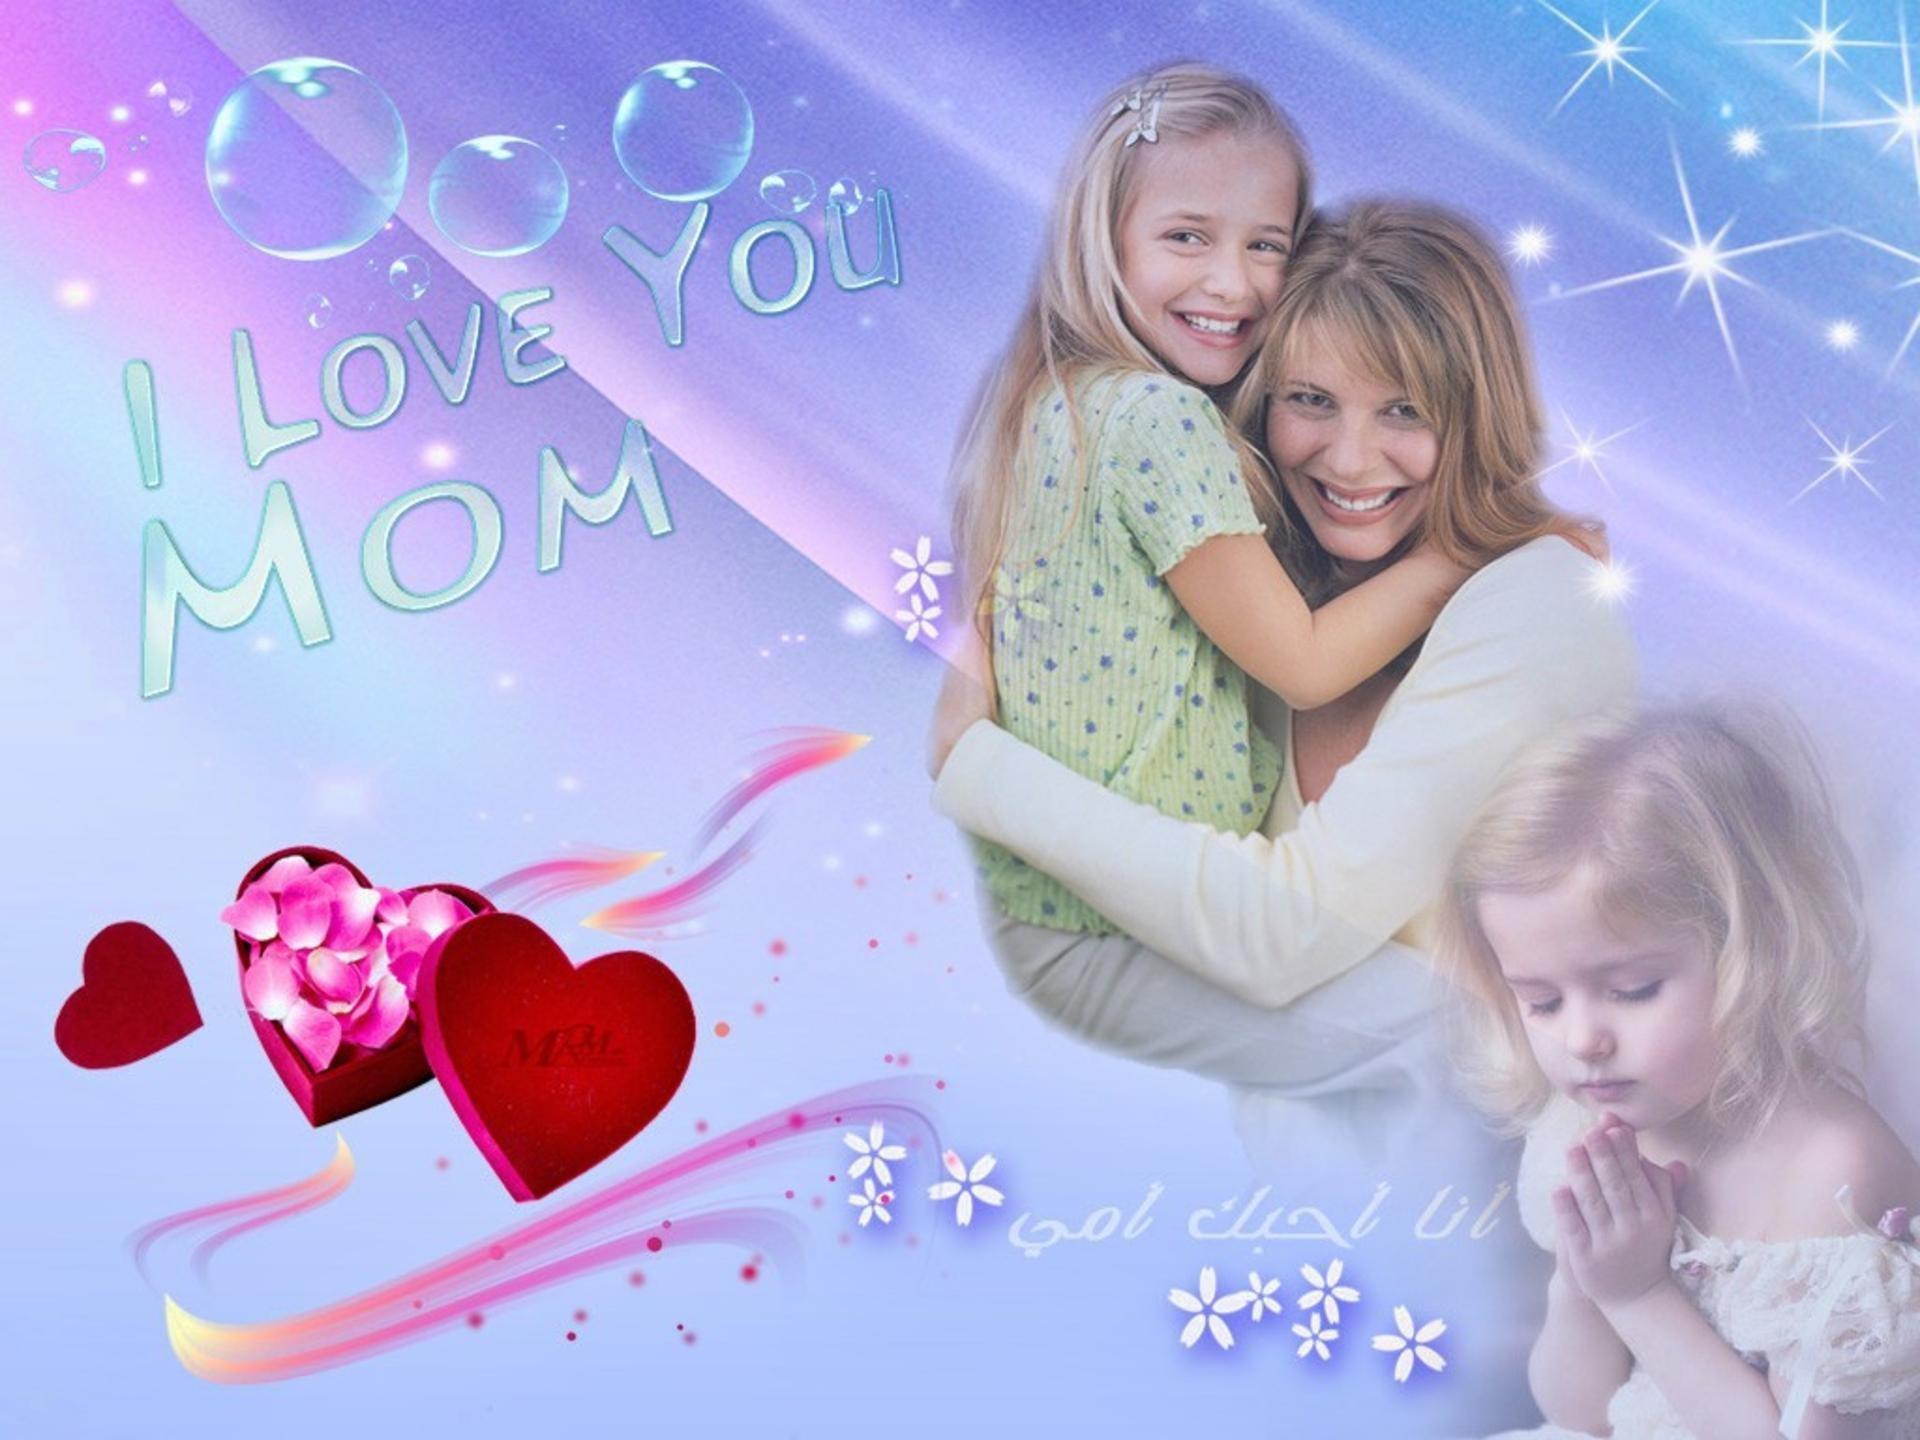 wallpaper love you mom